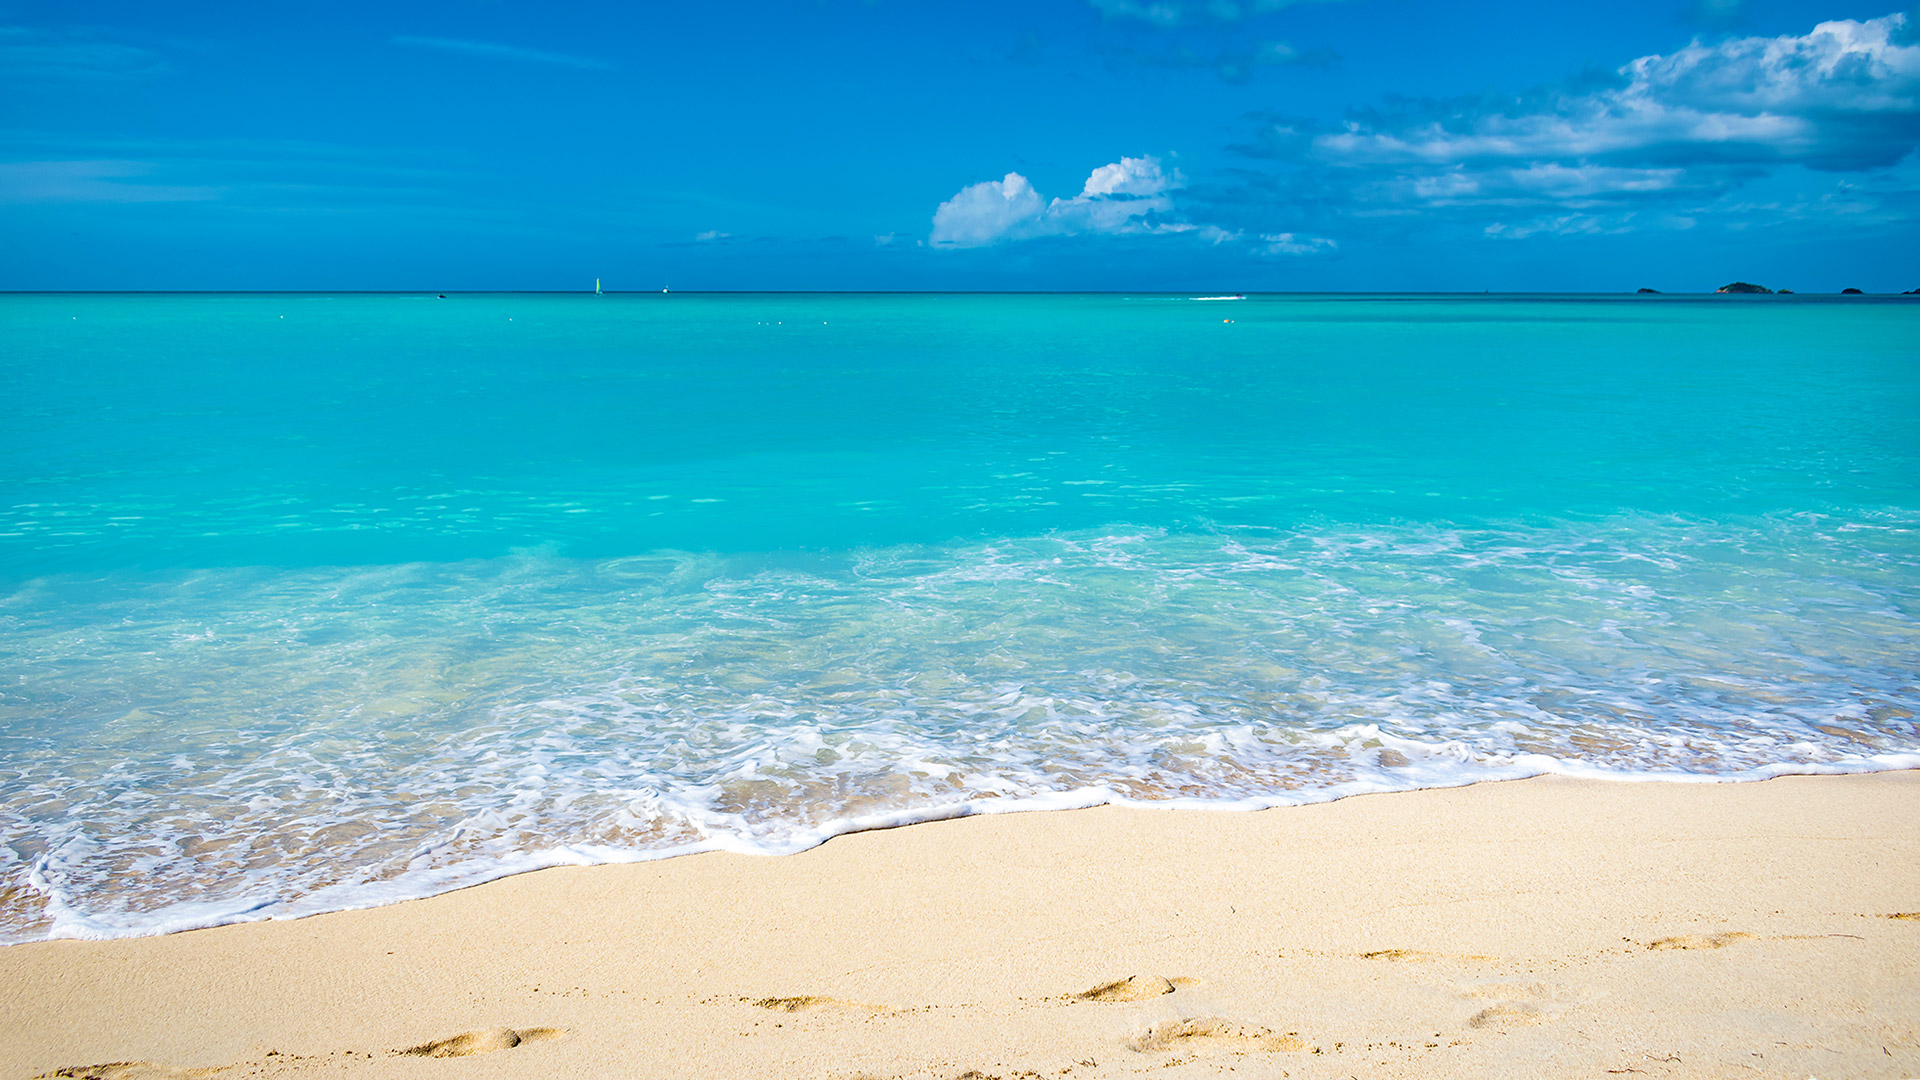 Sejur plaja Riviera Maya, Mexic, 11 zile - 15 mai 2021